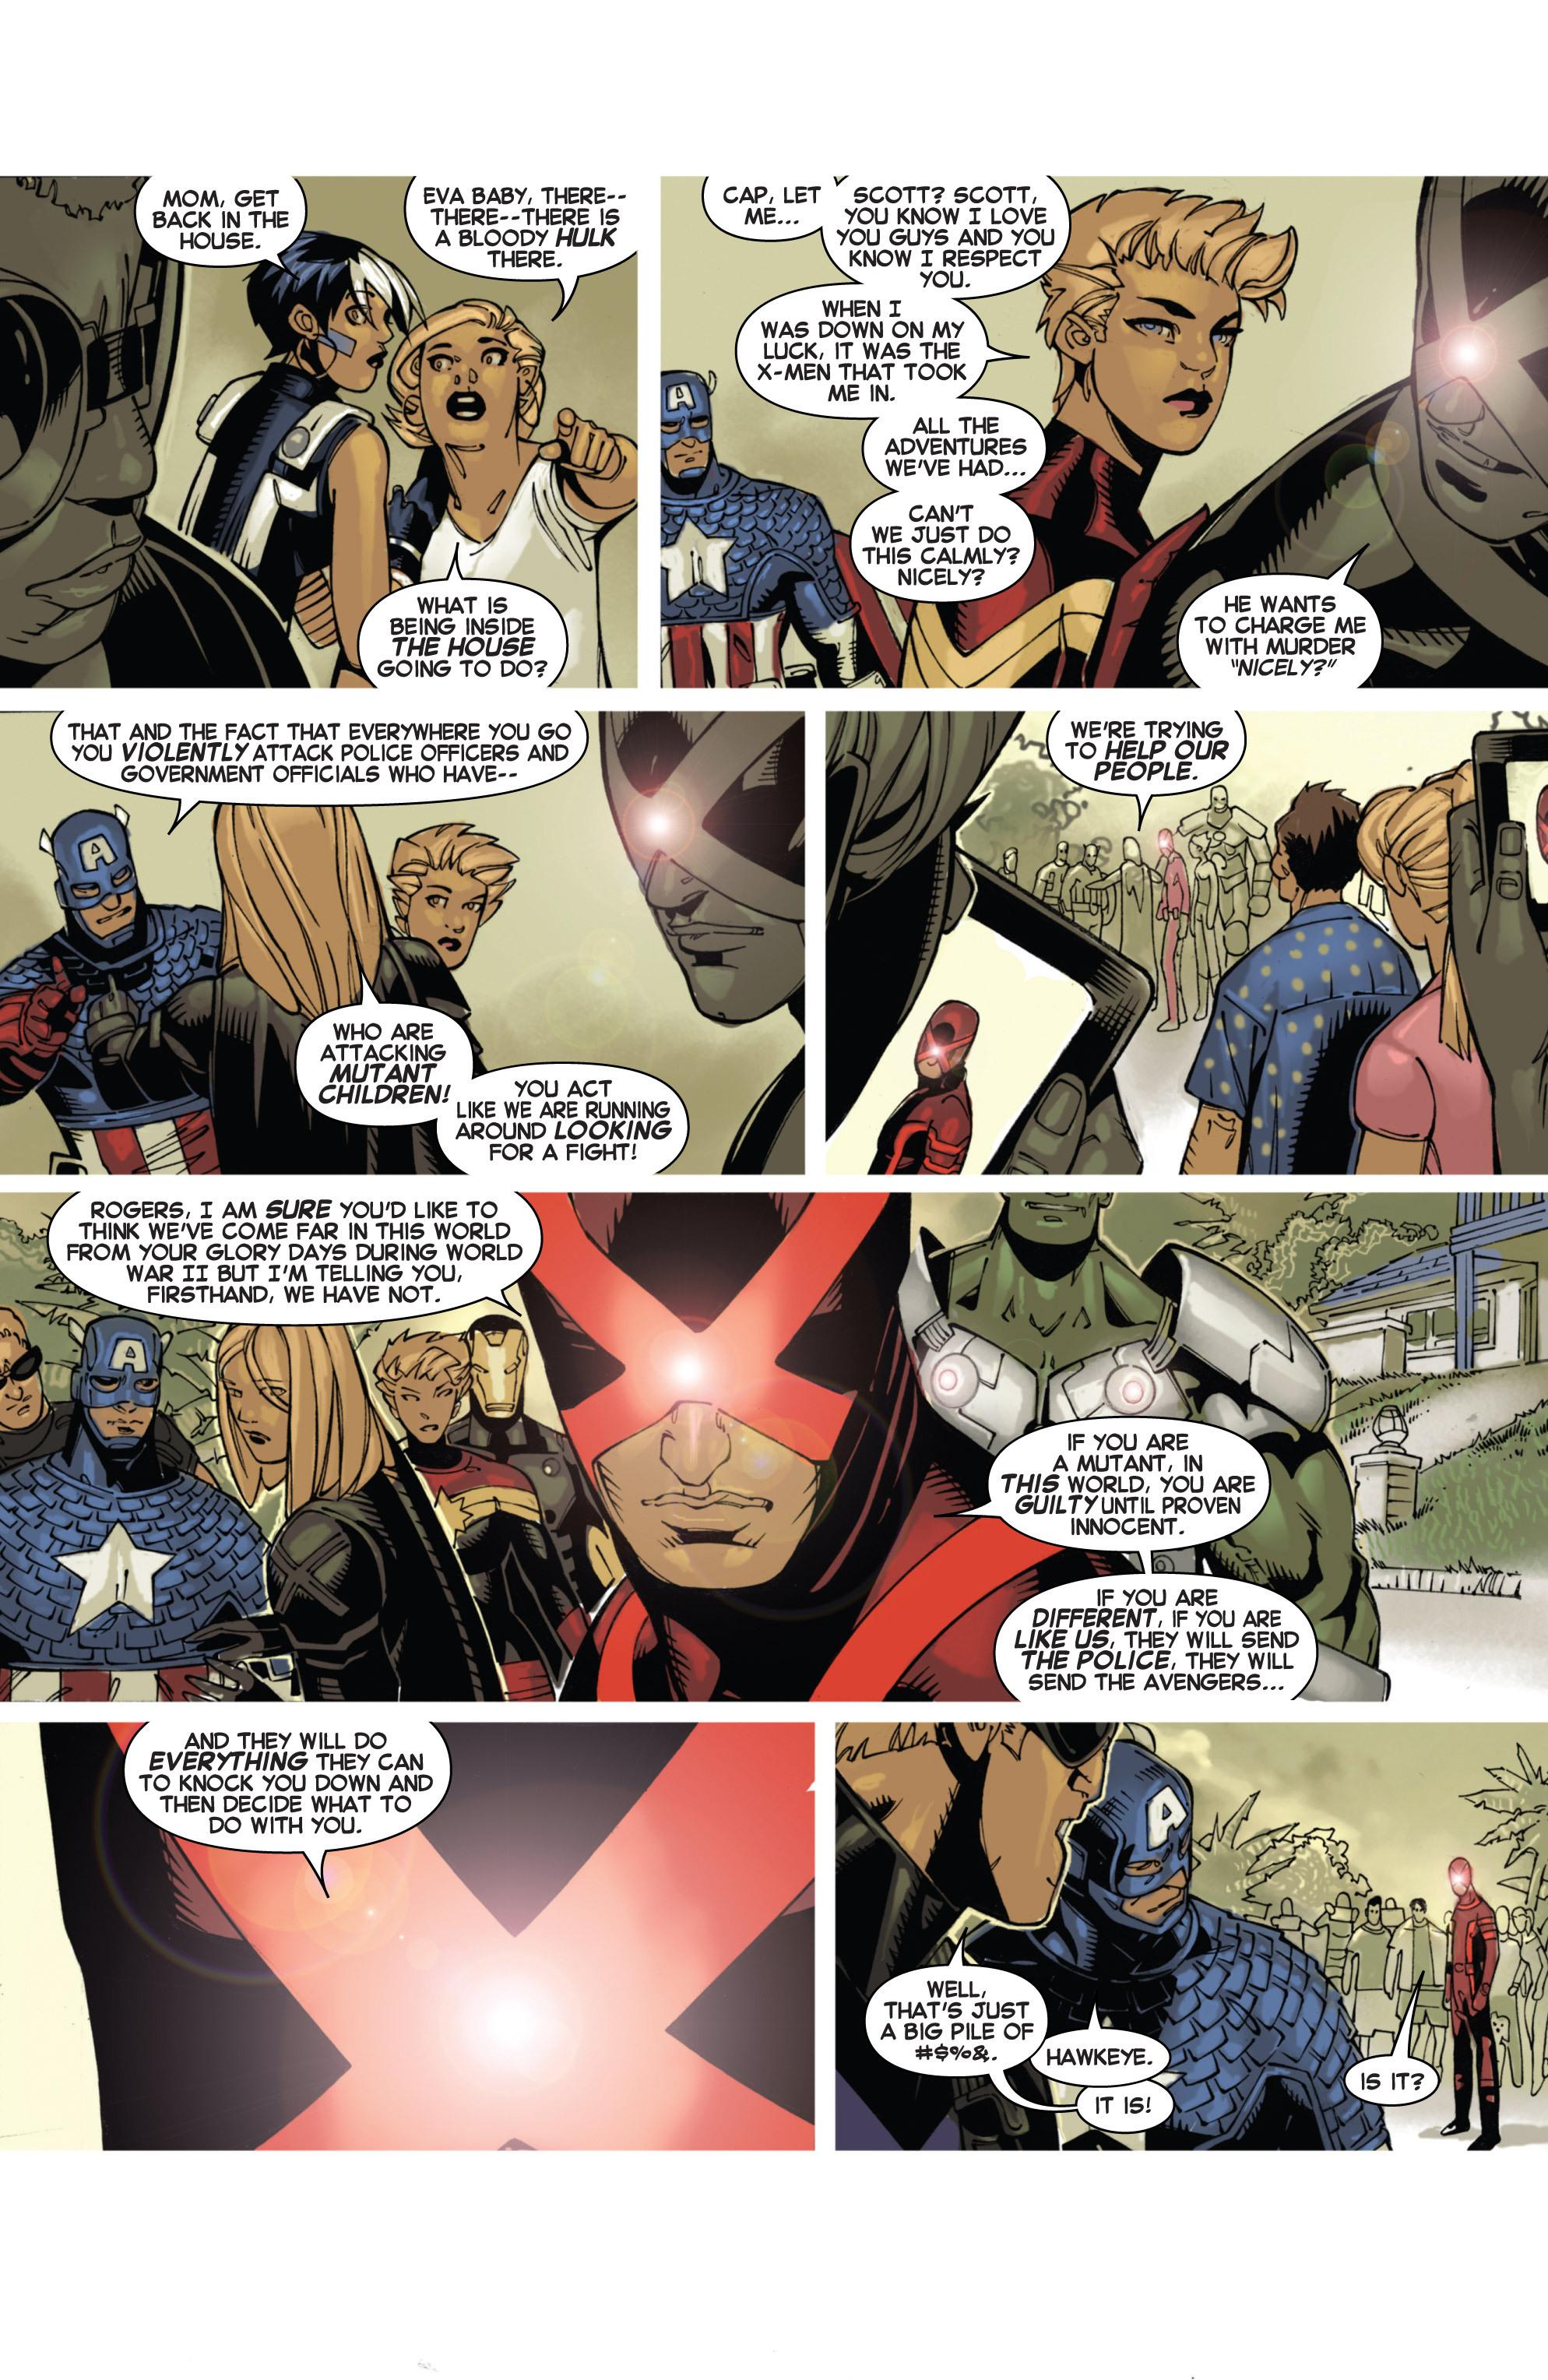 Read online Uncanny X-Men (2013) comic -  Issue # _TPB 1 - Revolution - 51